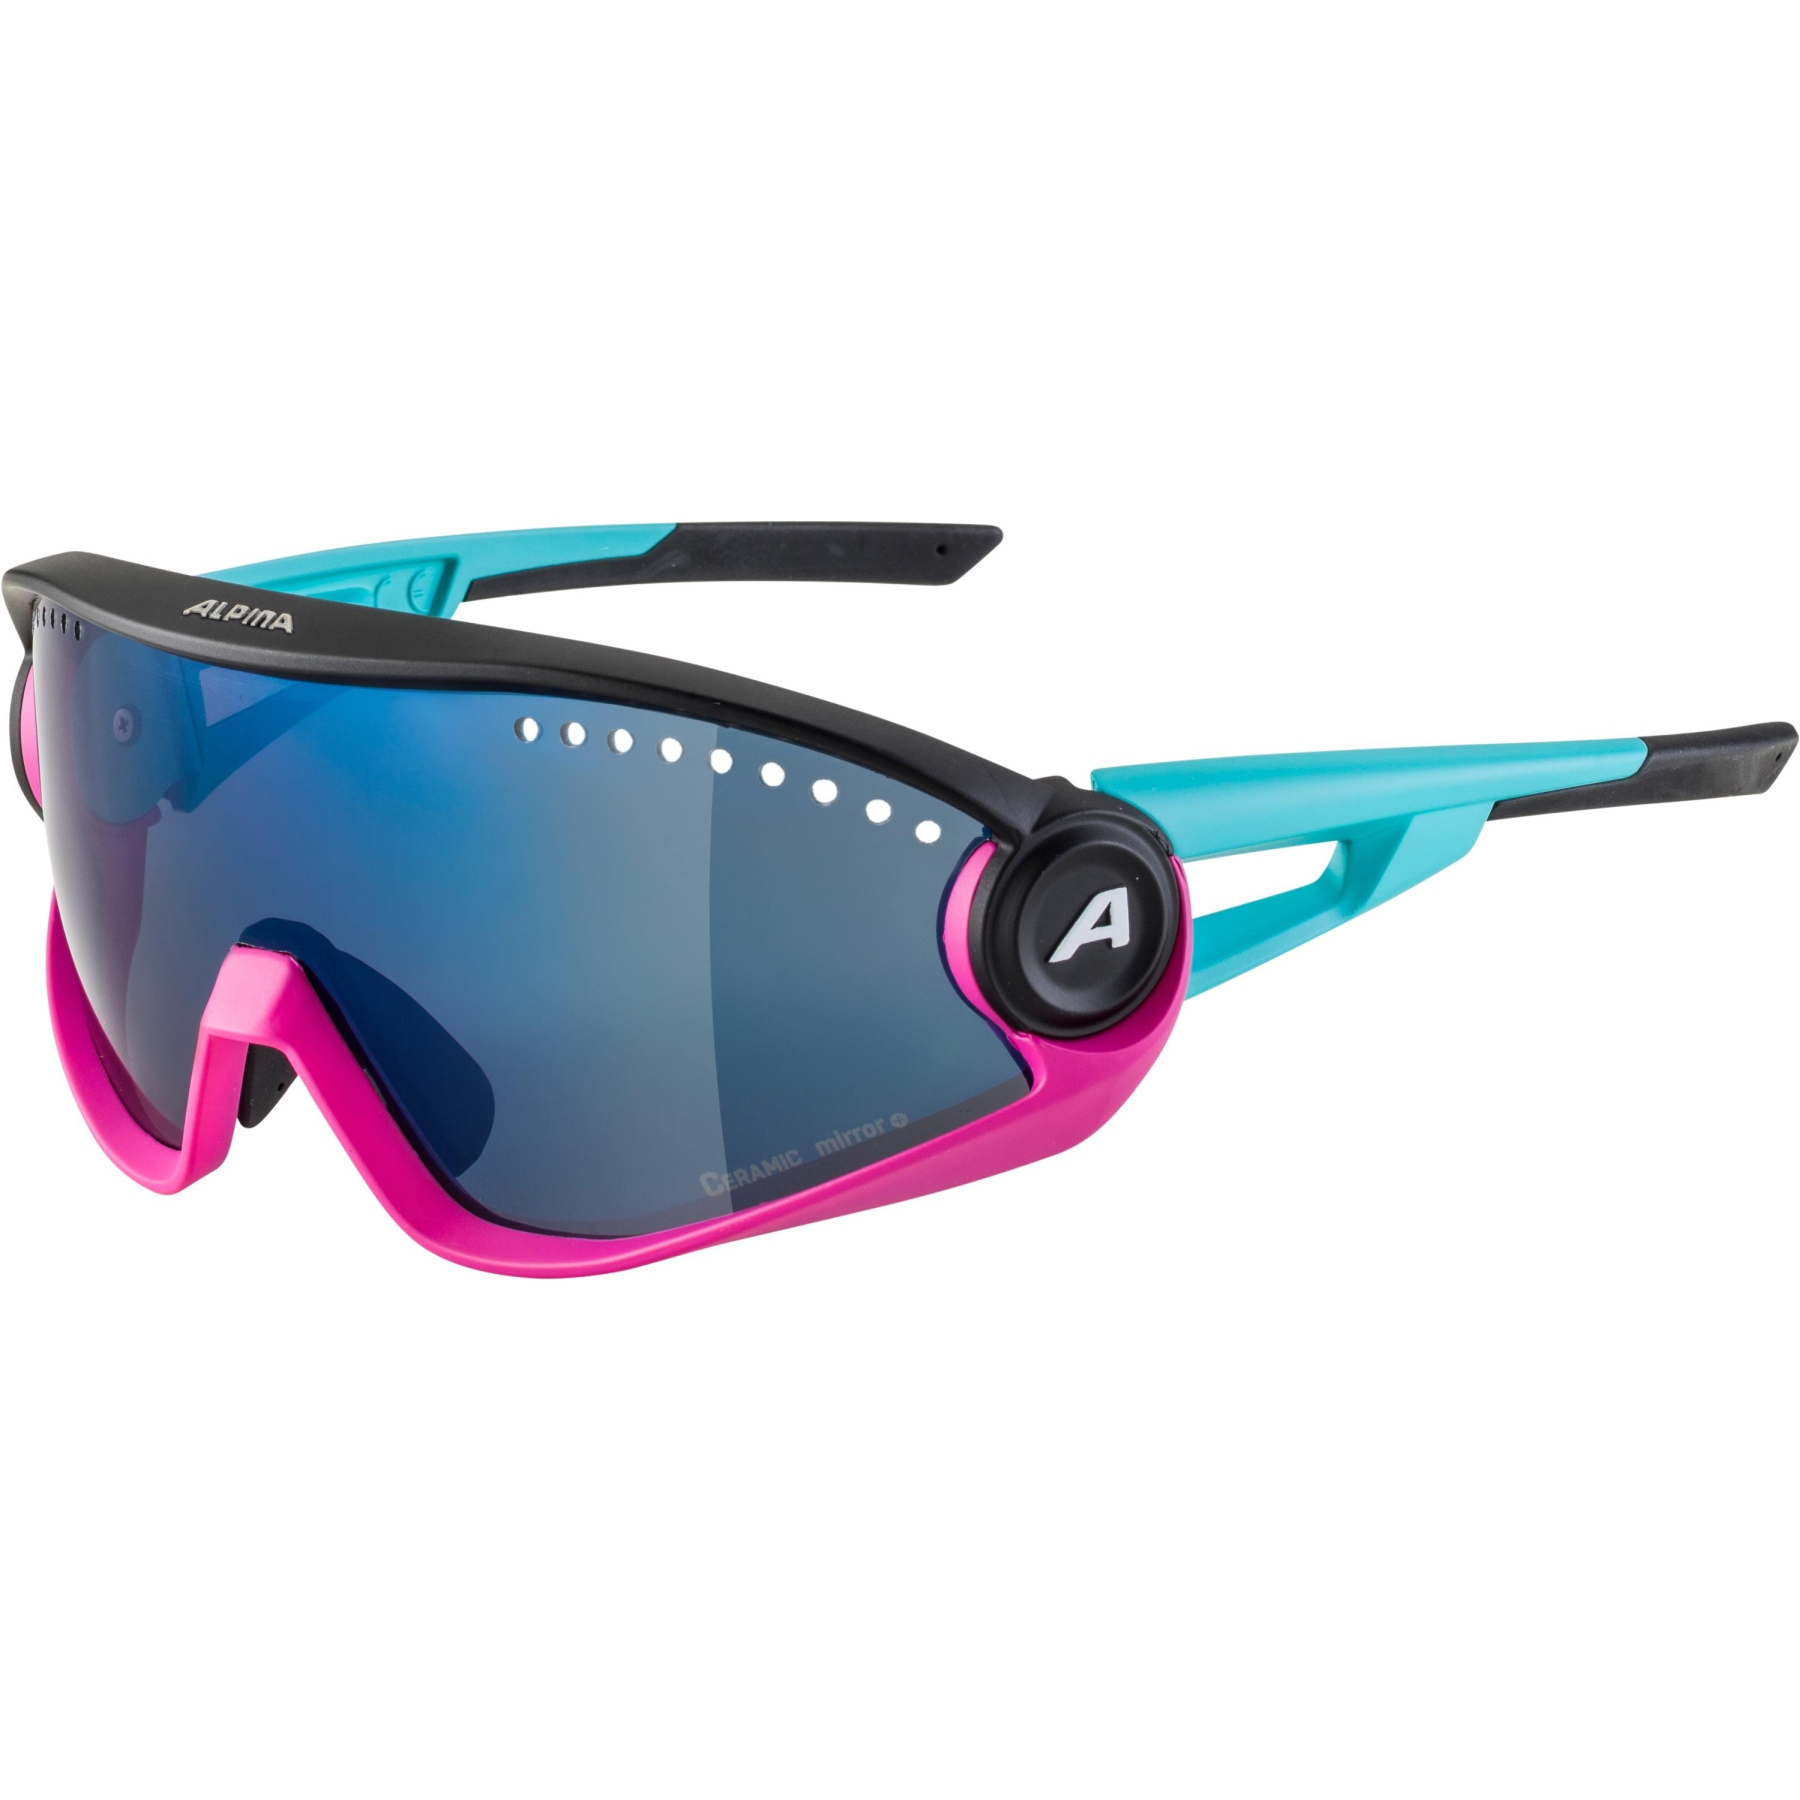 Image of Alpina 5W1NG CM+ Glasses - blue-magenta-black / blue mirror